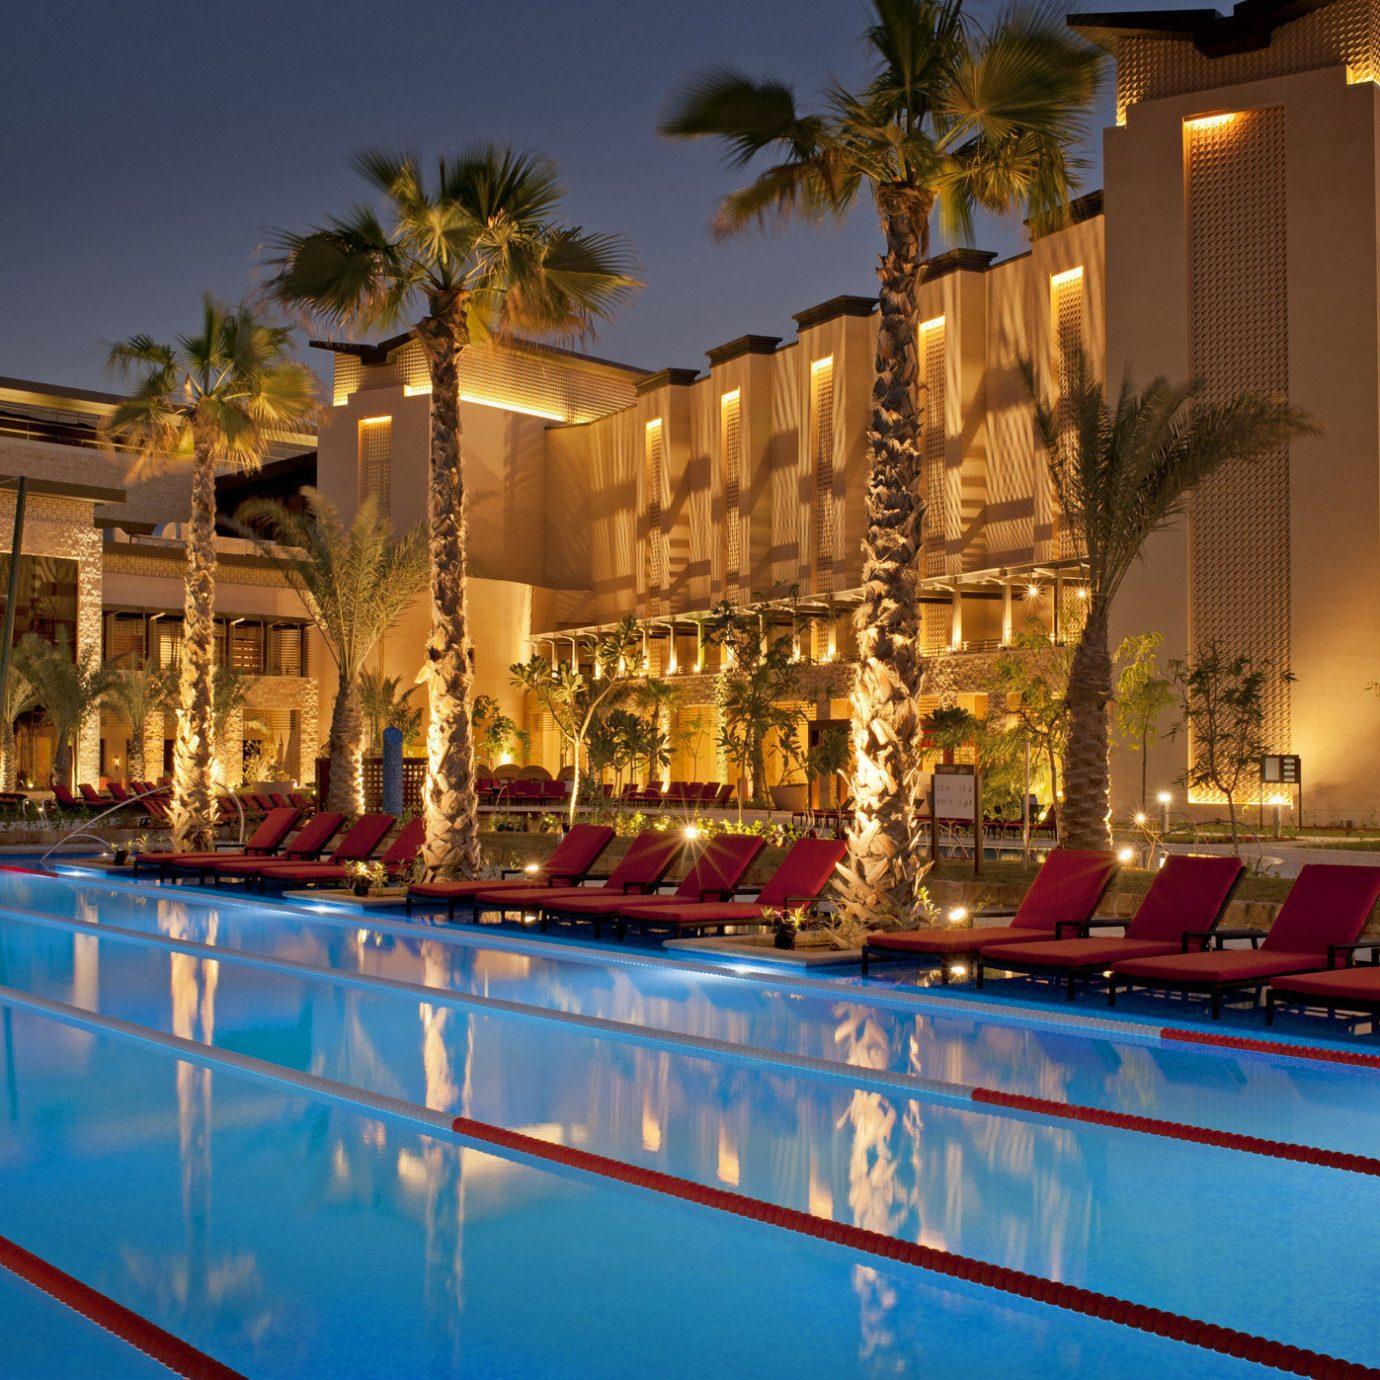 sky swimming pool Resort night palace plaza evening bright